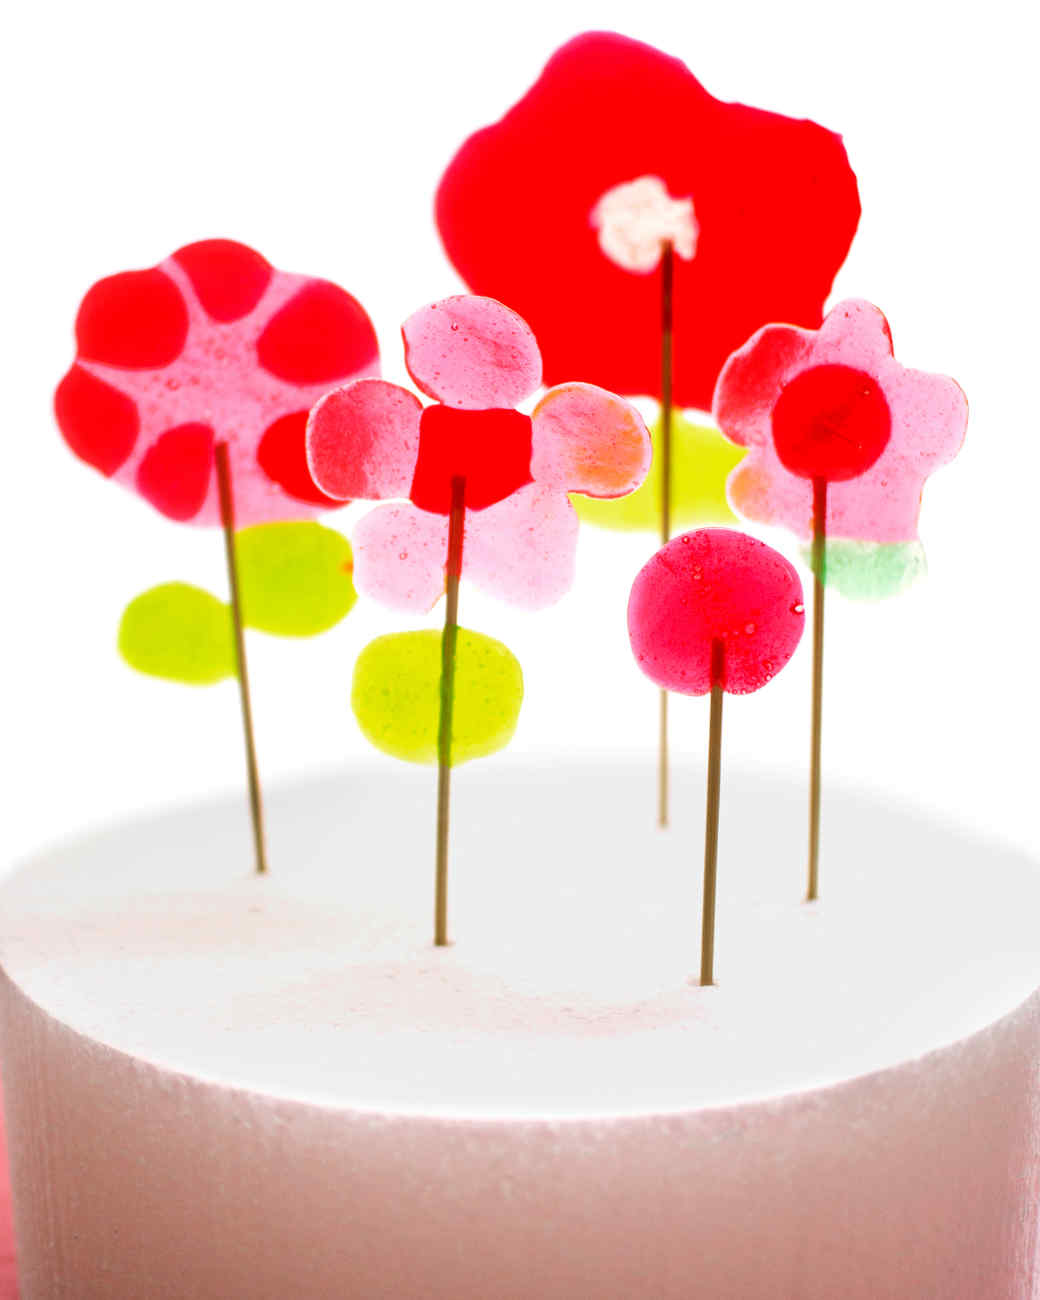 jodi-levine-candy-lolipops-2-0415.jpg